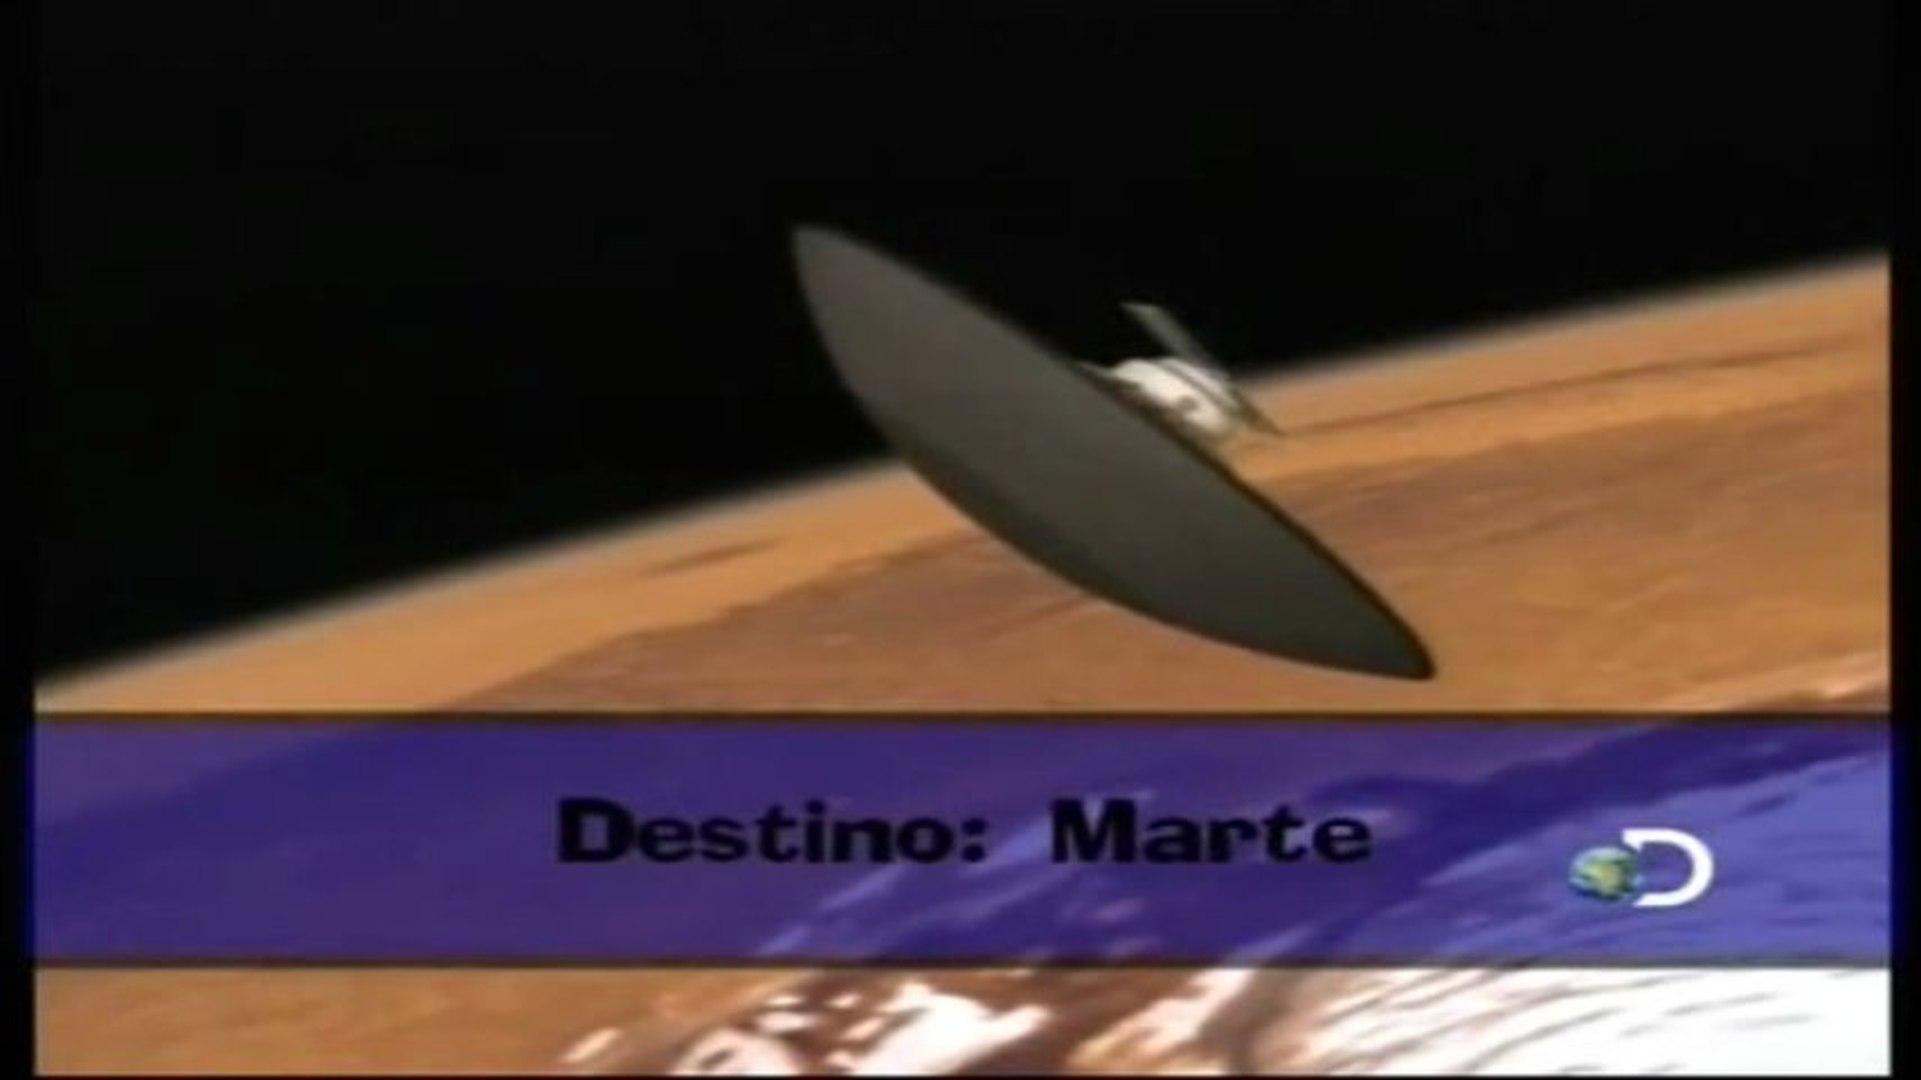 Discovery na Escola - Destino Marte [Discovery Channel]